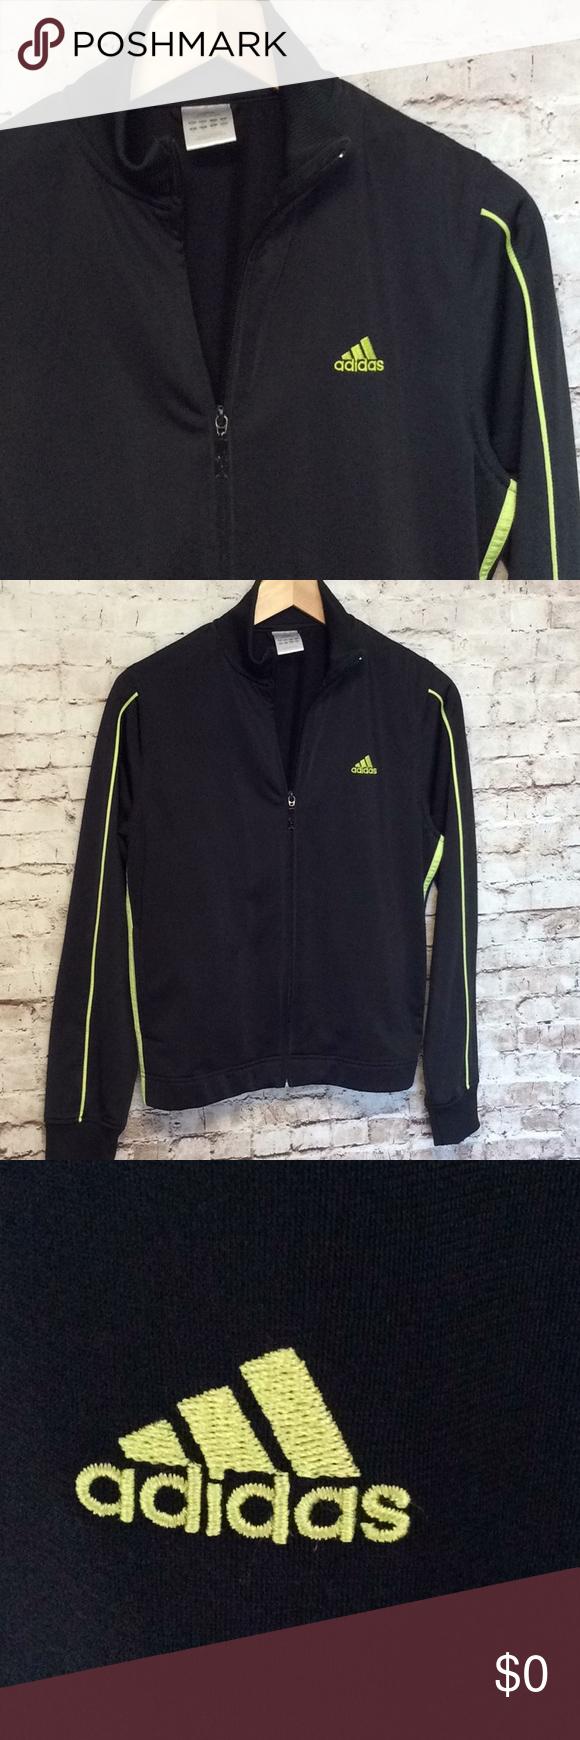 Adidas Athletic Zip Front Jacket Athletic Zip Jacket | 49f906a - grind.website